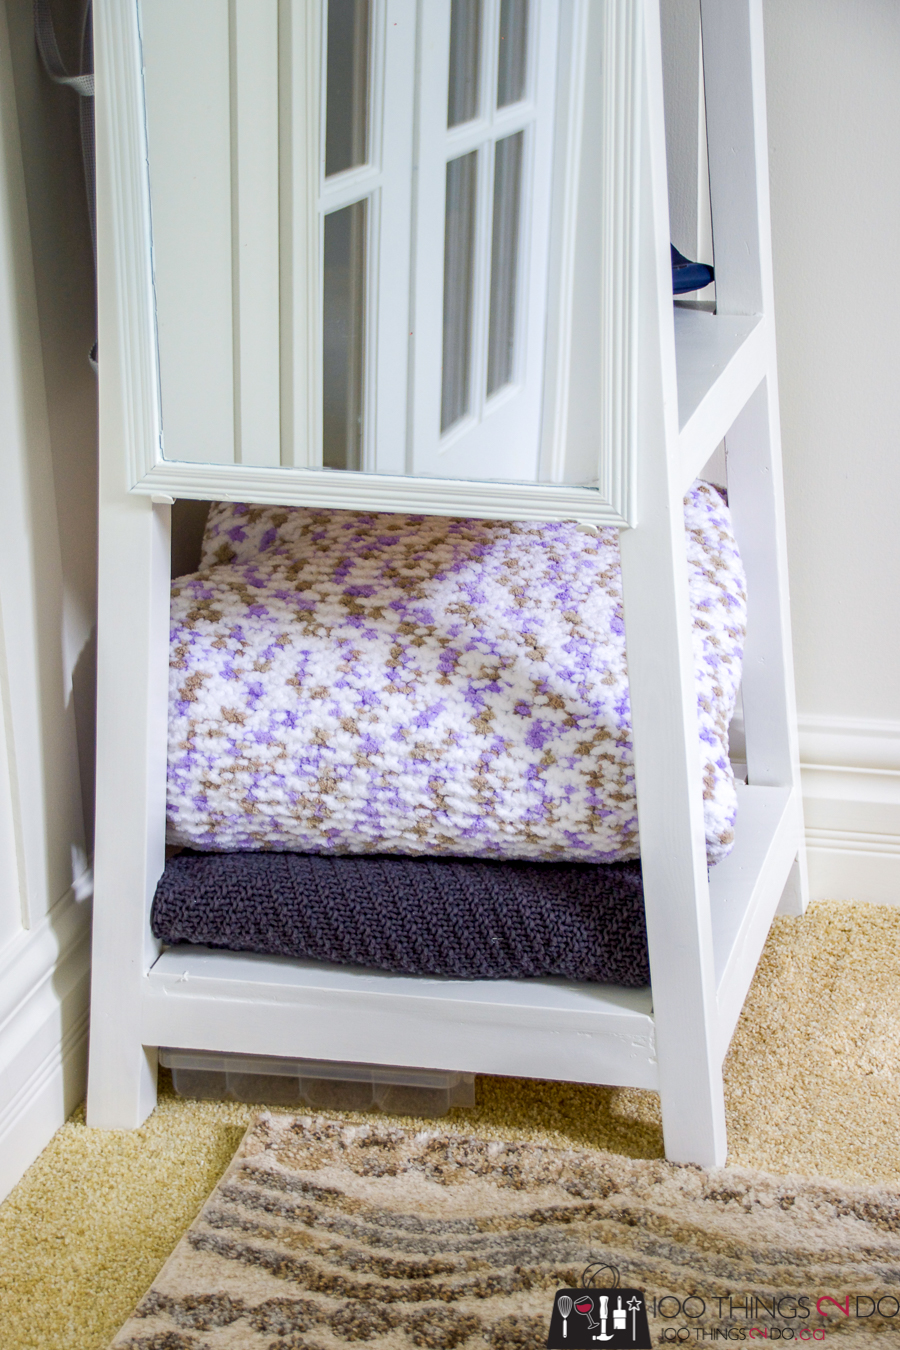 Freestanding coat rack with shelves